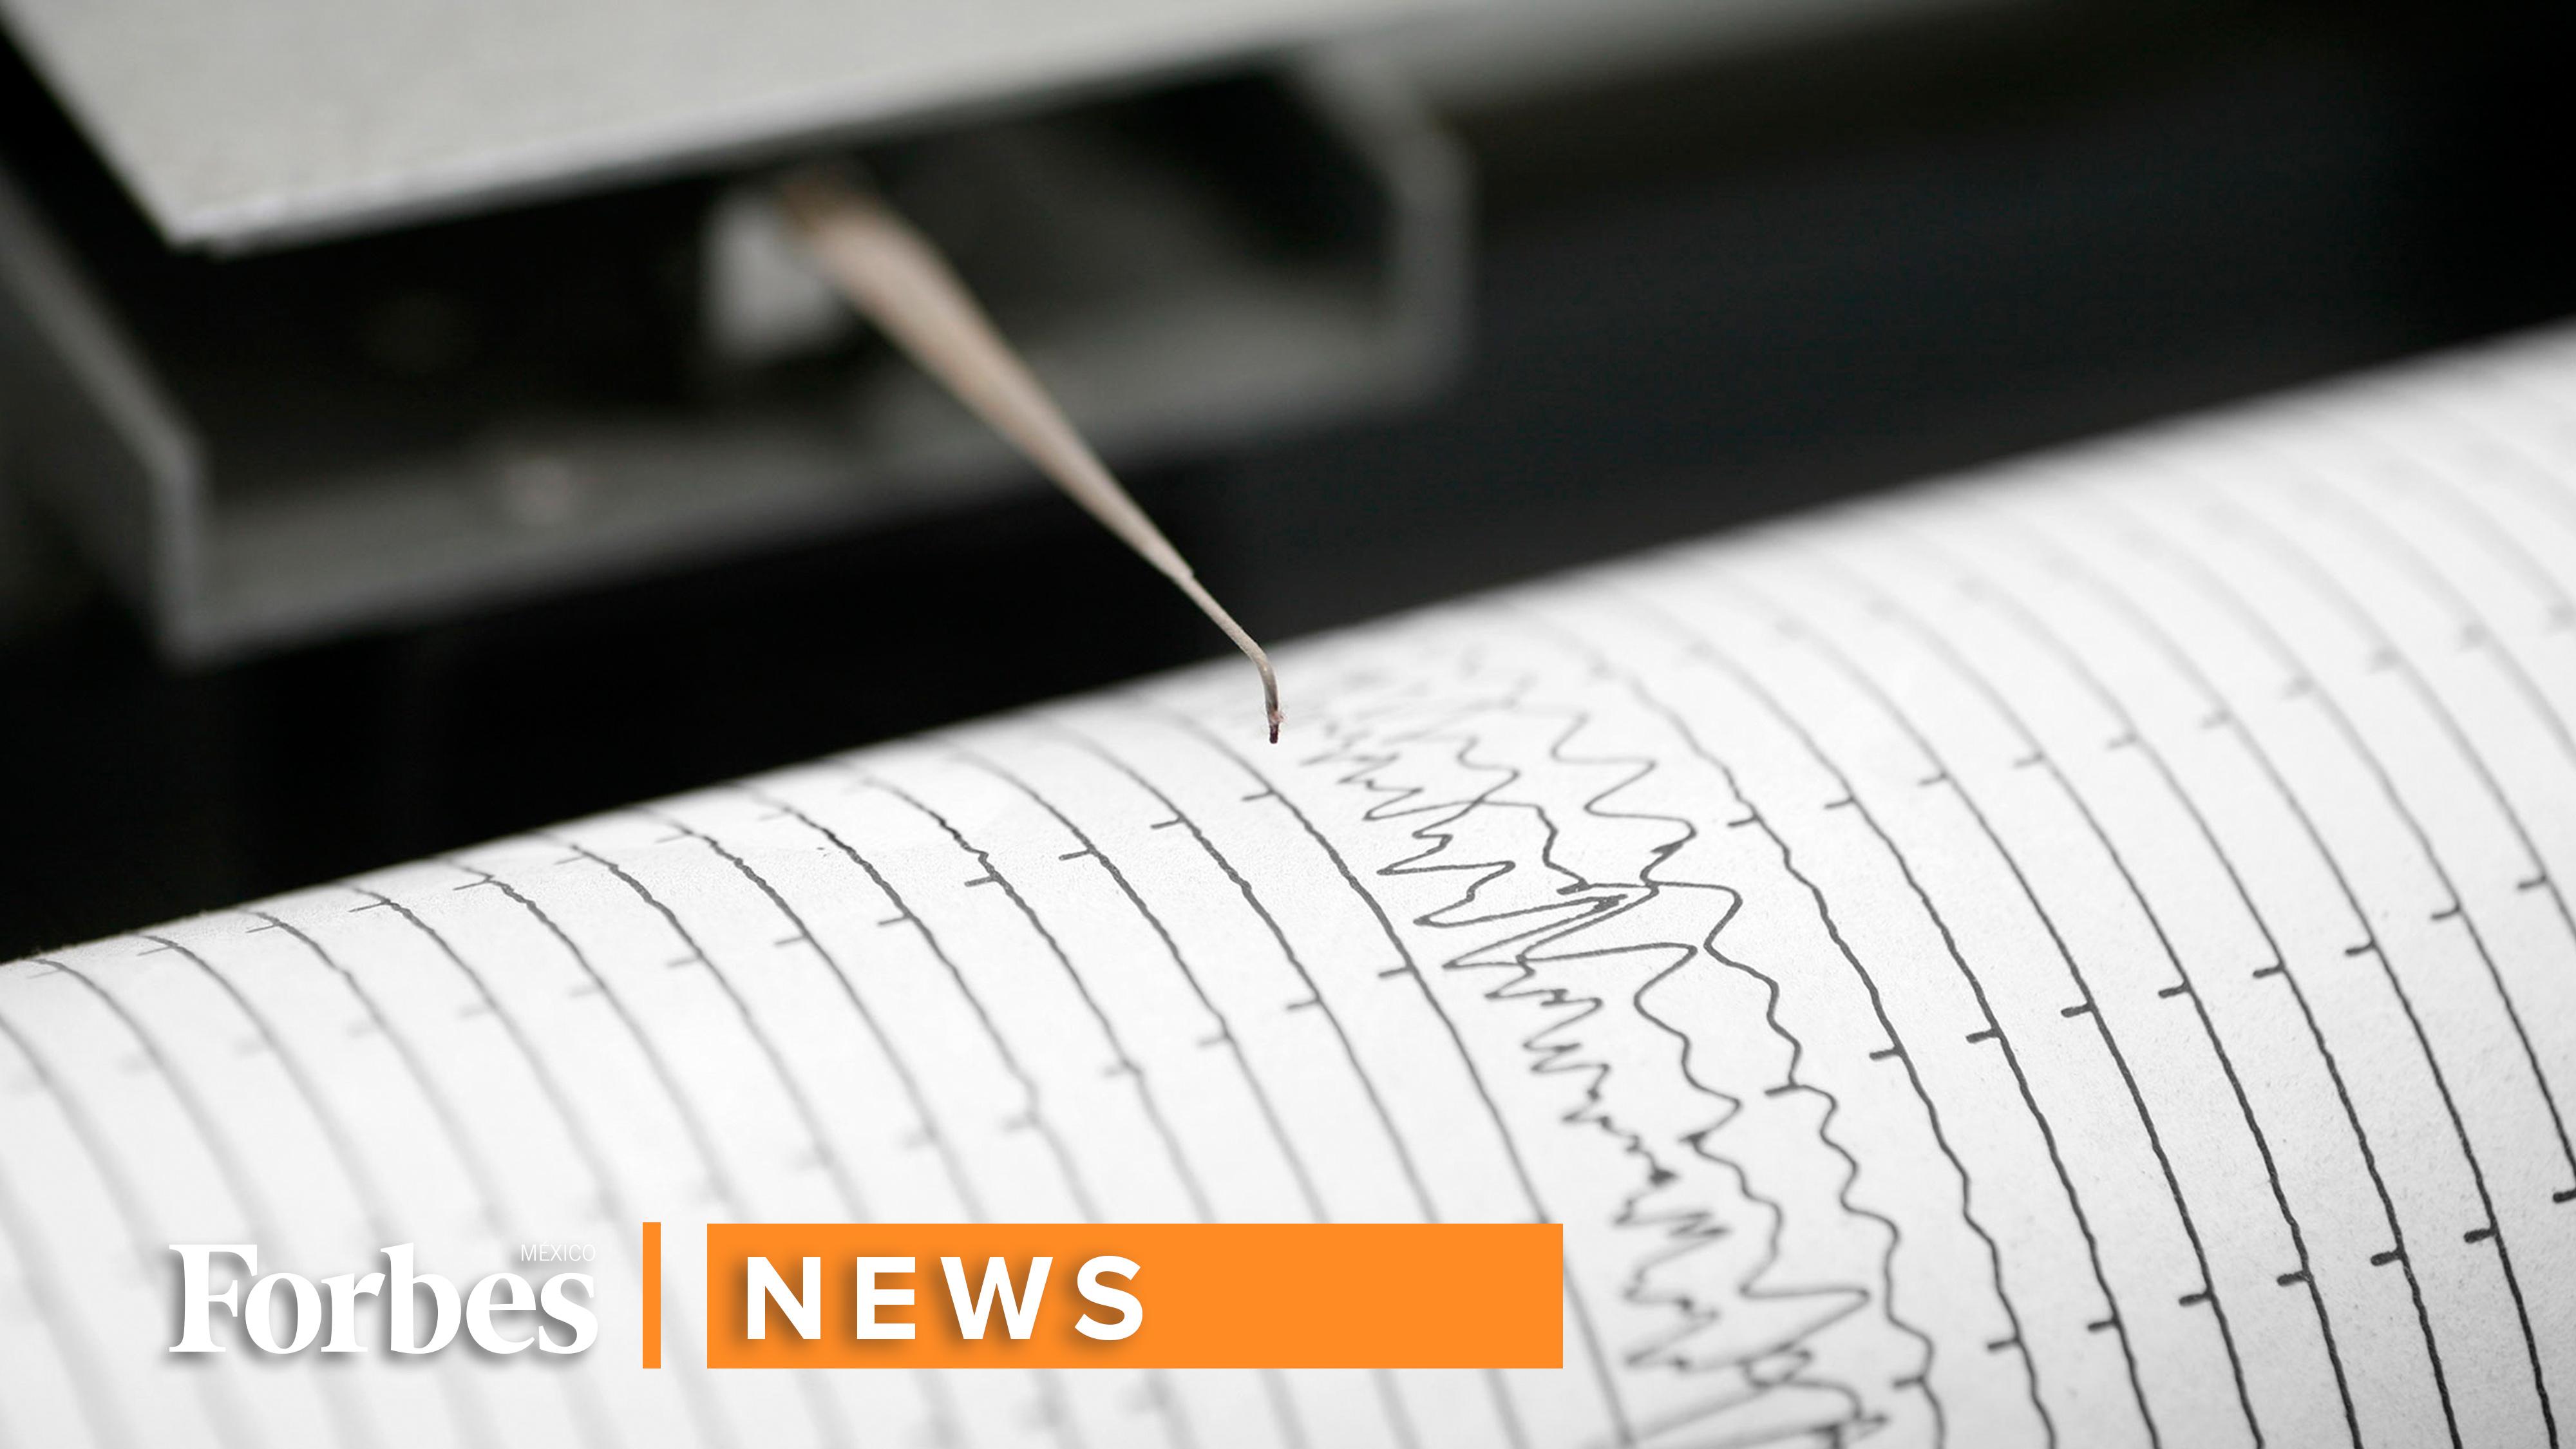 Sismo de 7.7 sacude a Cuba y Jamaica; alertan posible tsunami